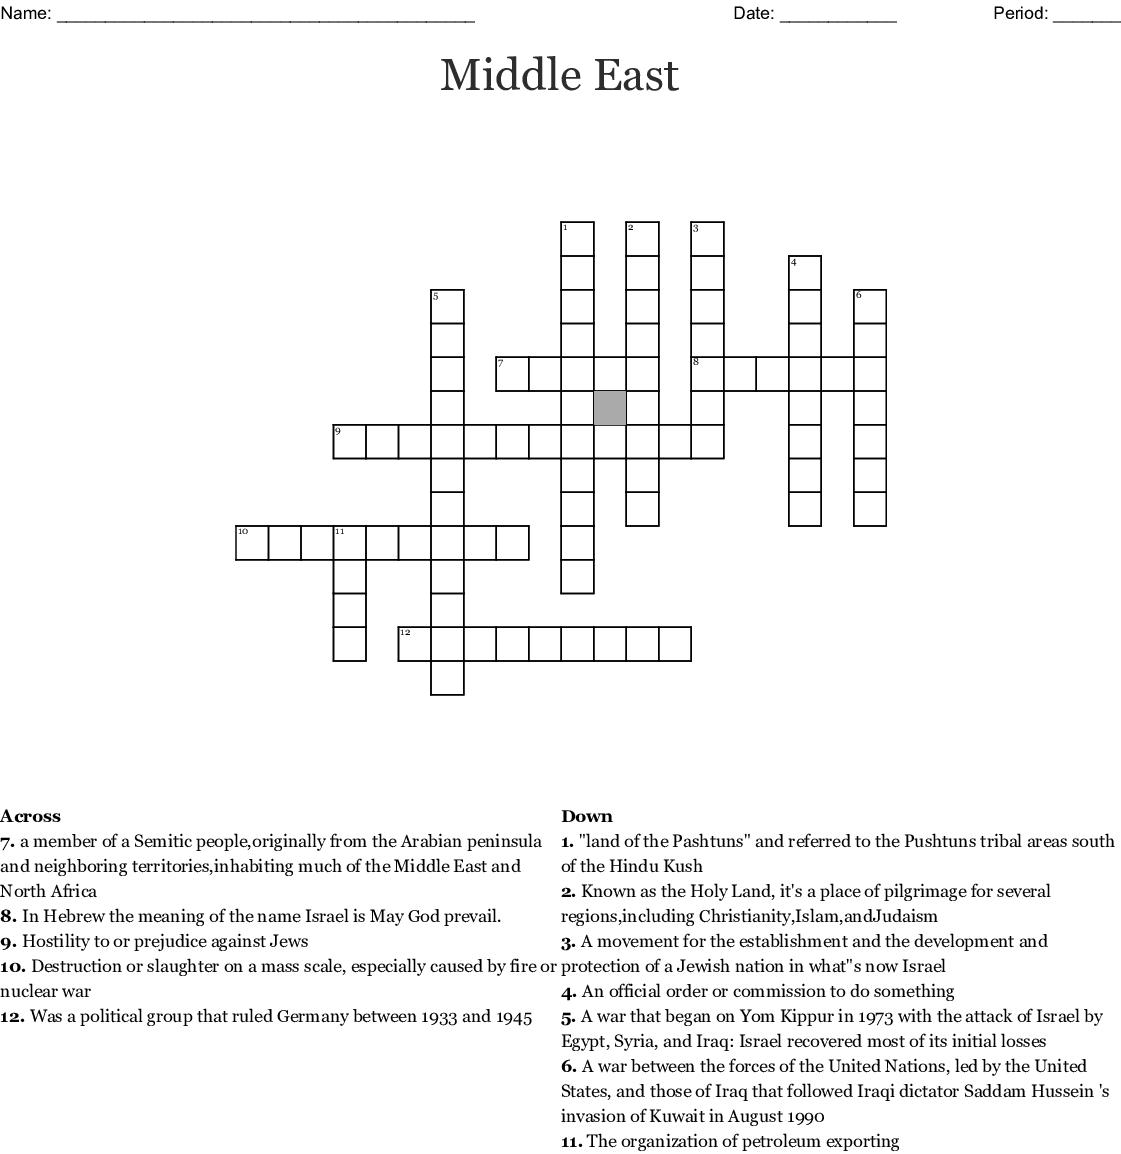 Middle East Crossword - WordMint